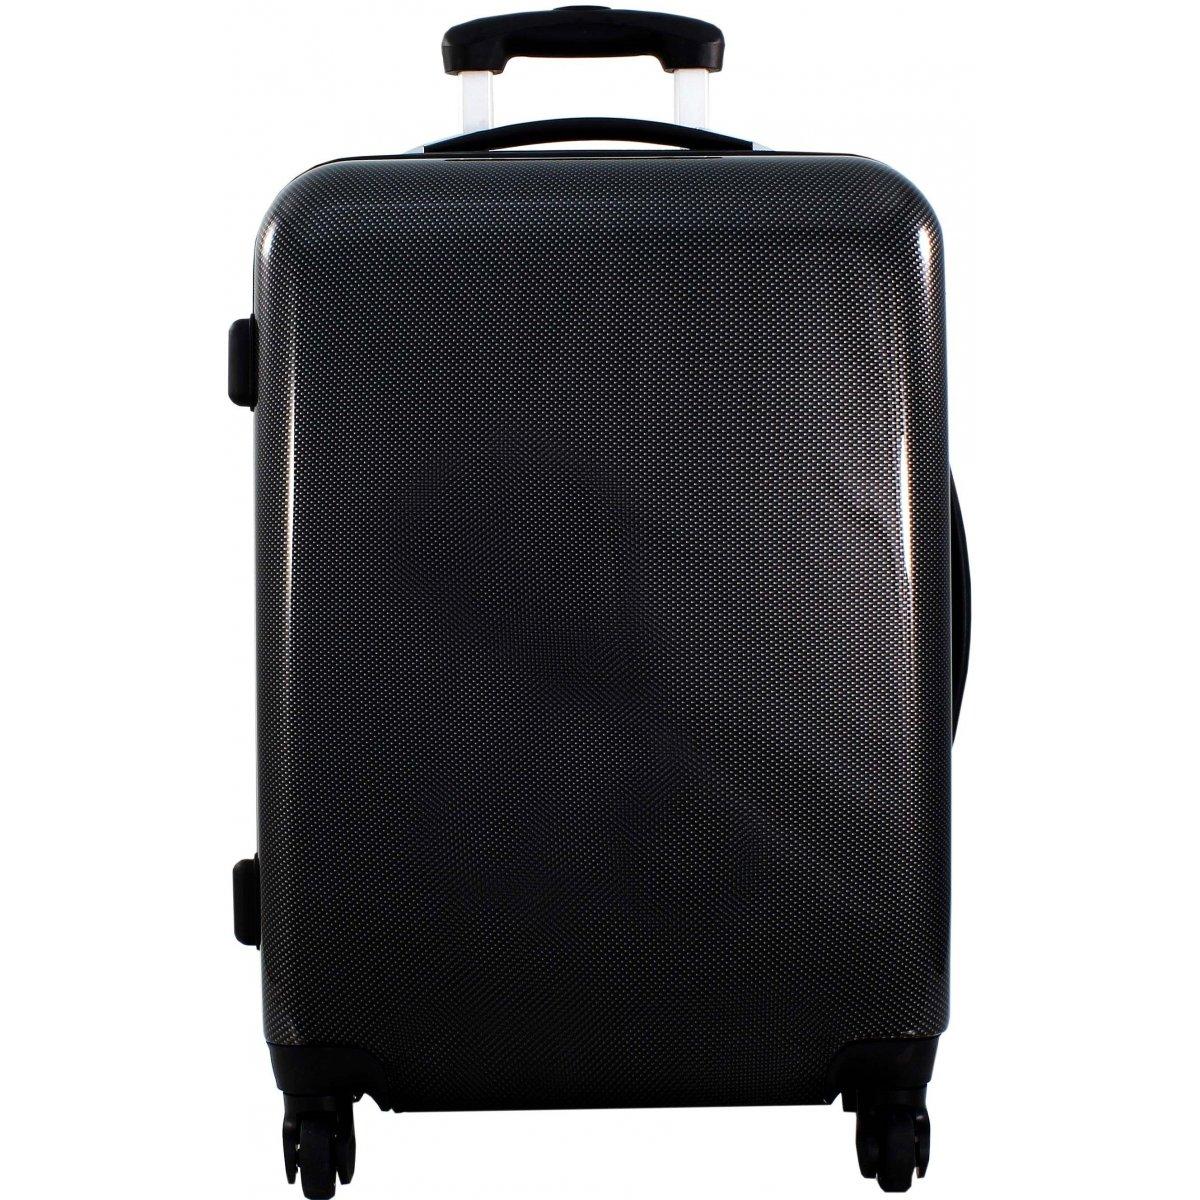 lot 3 valises dont 1 cabine ryanair david jones ba2033 couleur principale black squares. Black Bedroom Furniture Sets. Home Design Ideas